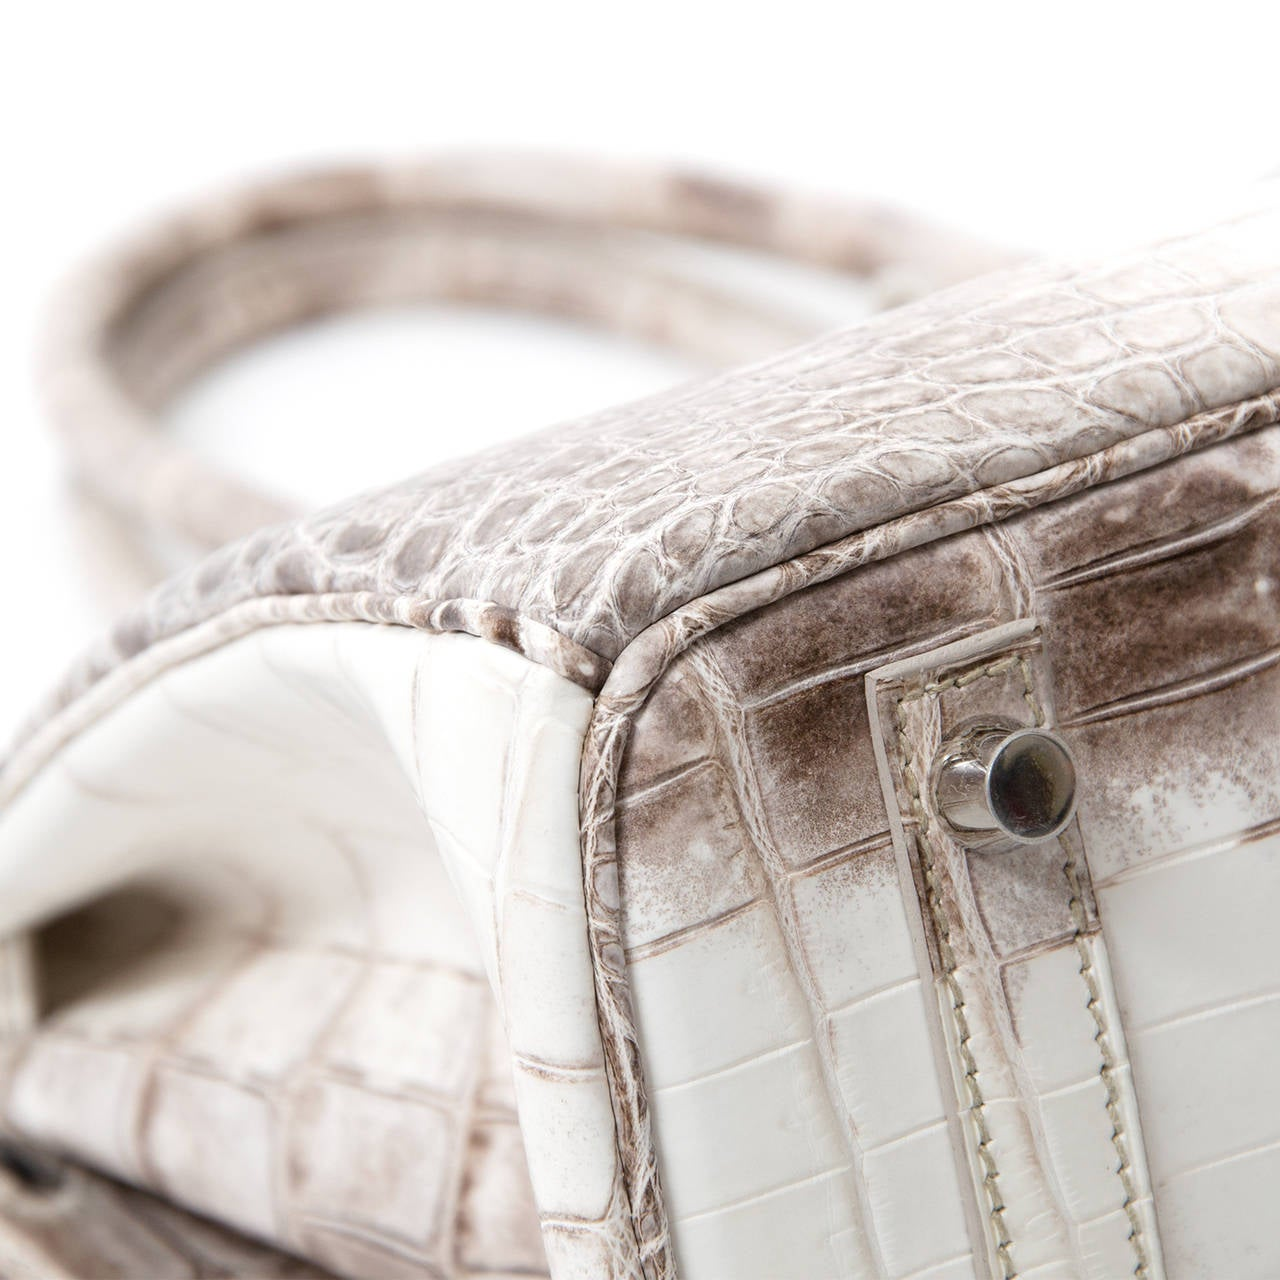 Herm��s Birkin Bag Crocodile Niloticus Himalaya Handbag White PHW ...